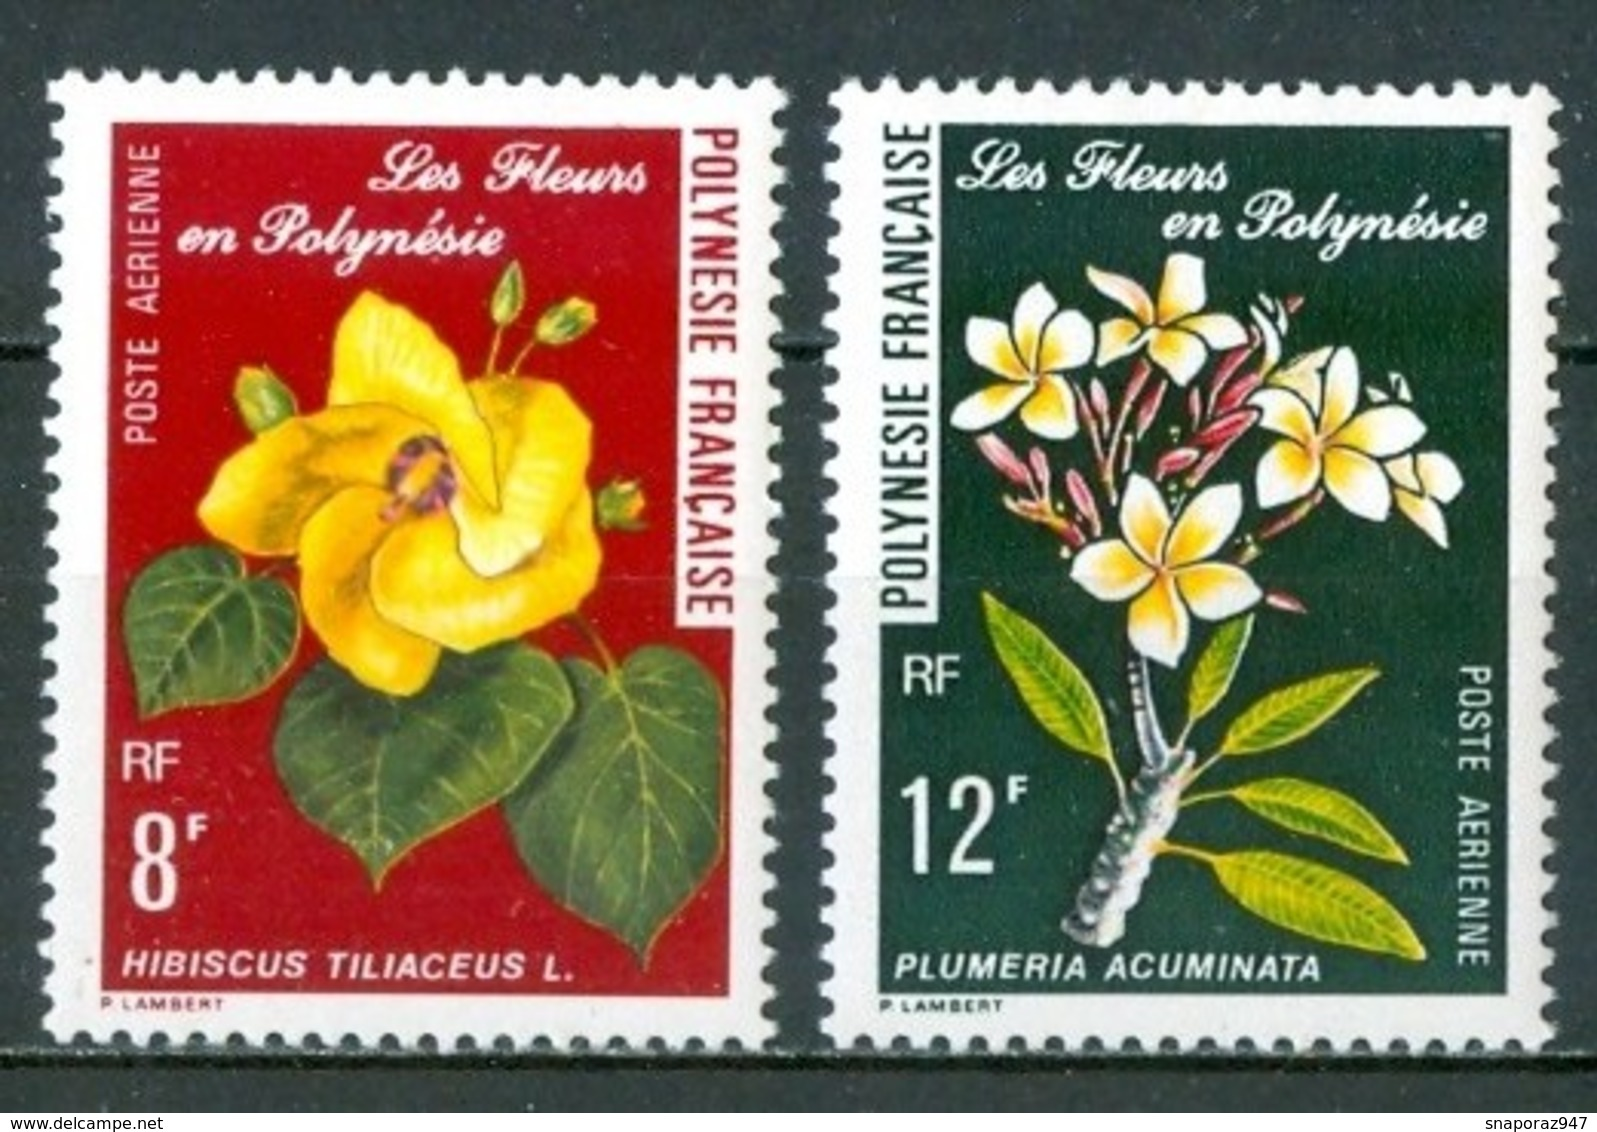 1977 Polinesia Fiori Flovers Fleurs MNH** Fio193 - Polinesia Francese